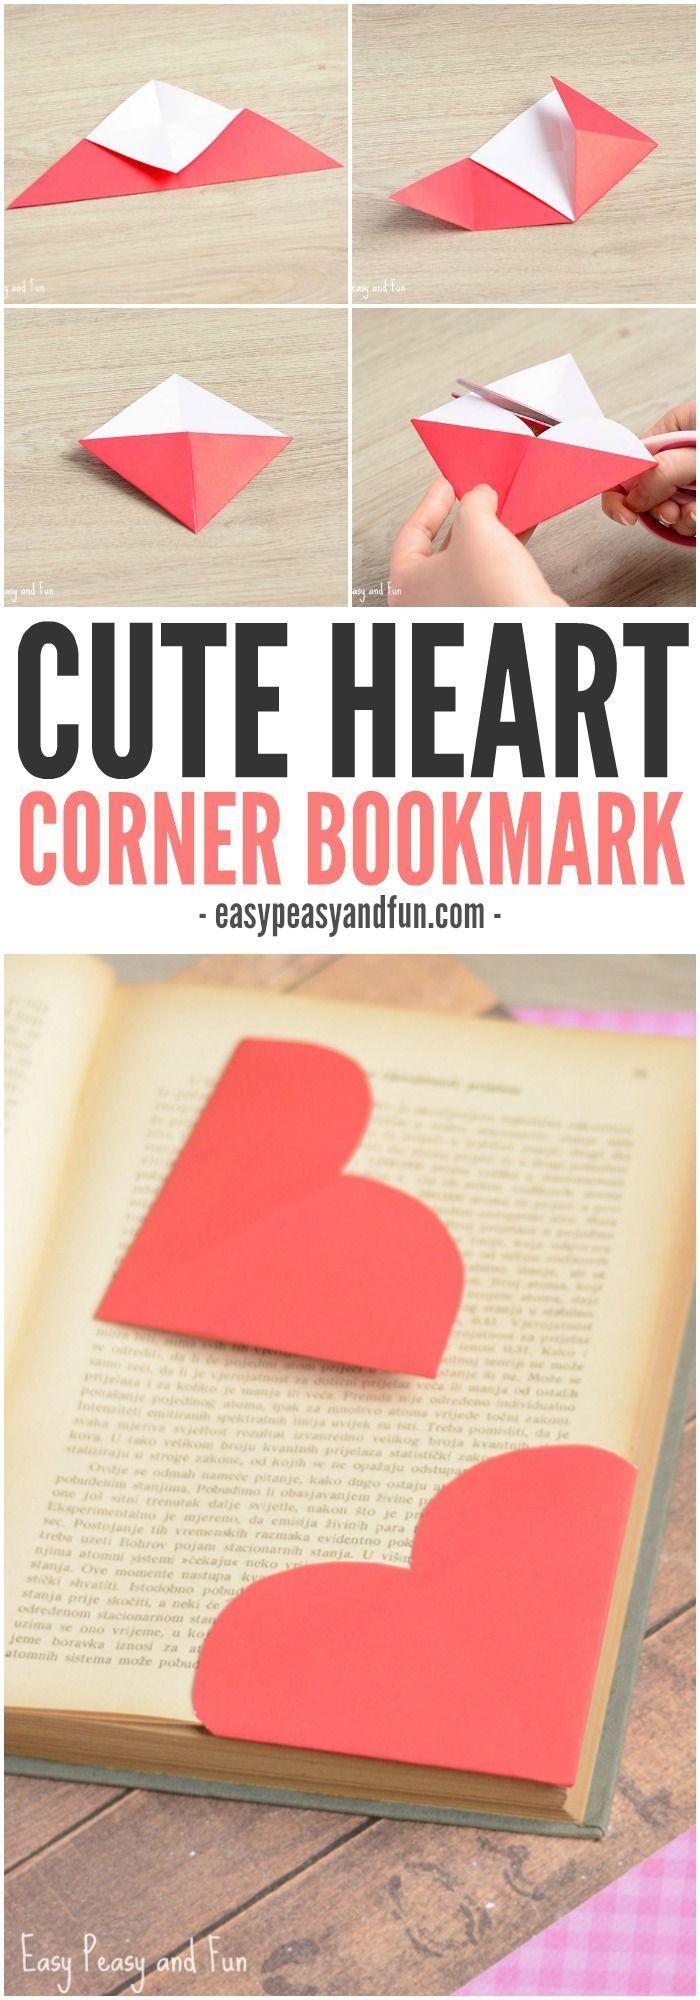 Heart Corner Bookmarks 728 best DIY for